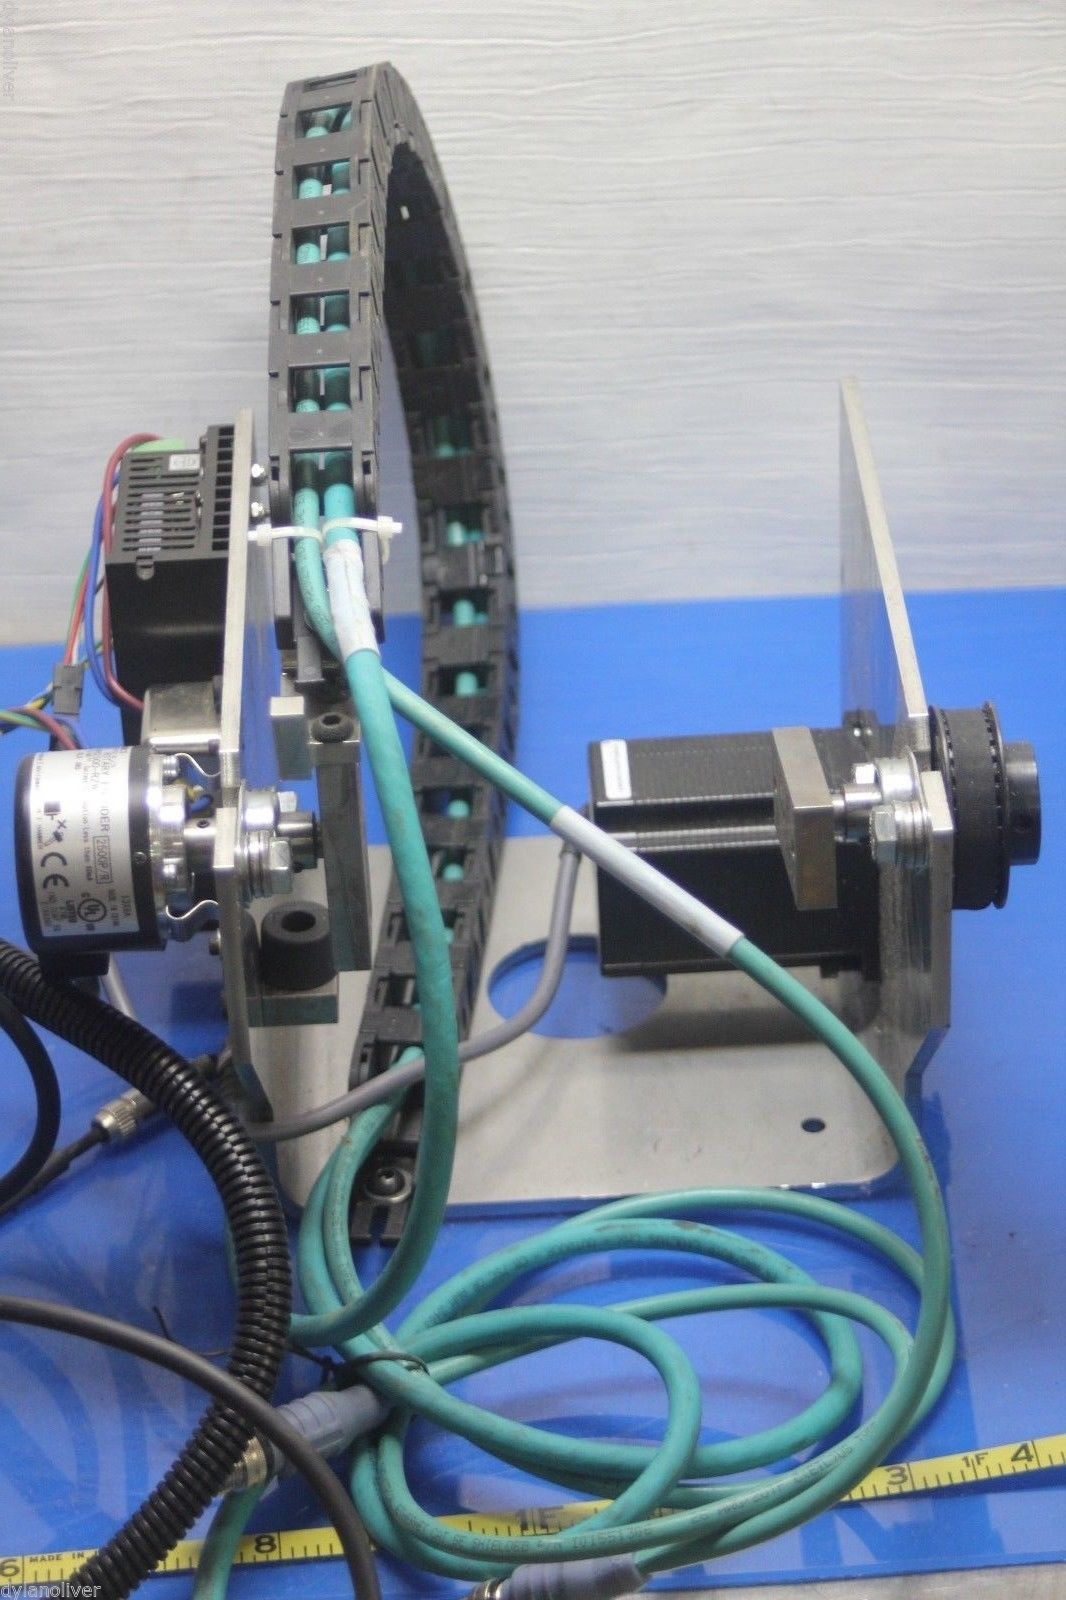 Sure Step STP-DRV-6575 Stepper Drive Motor and 50 similar items